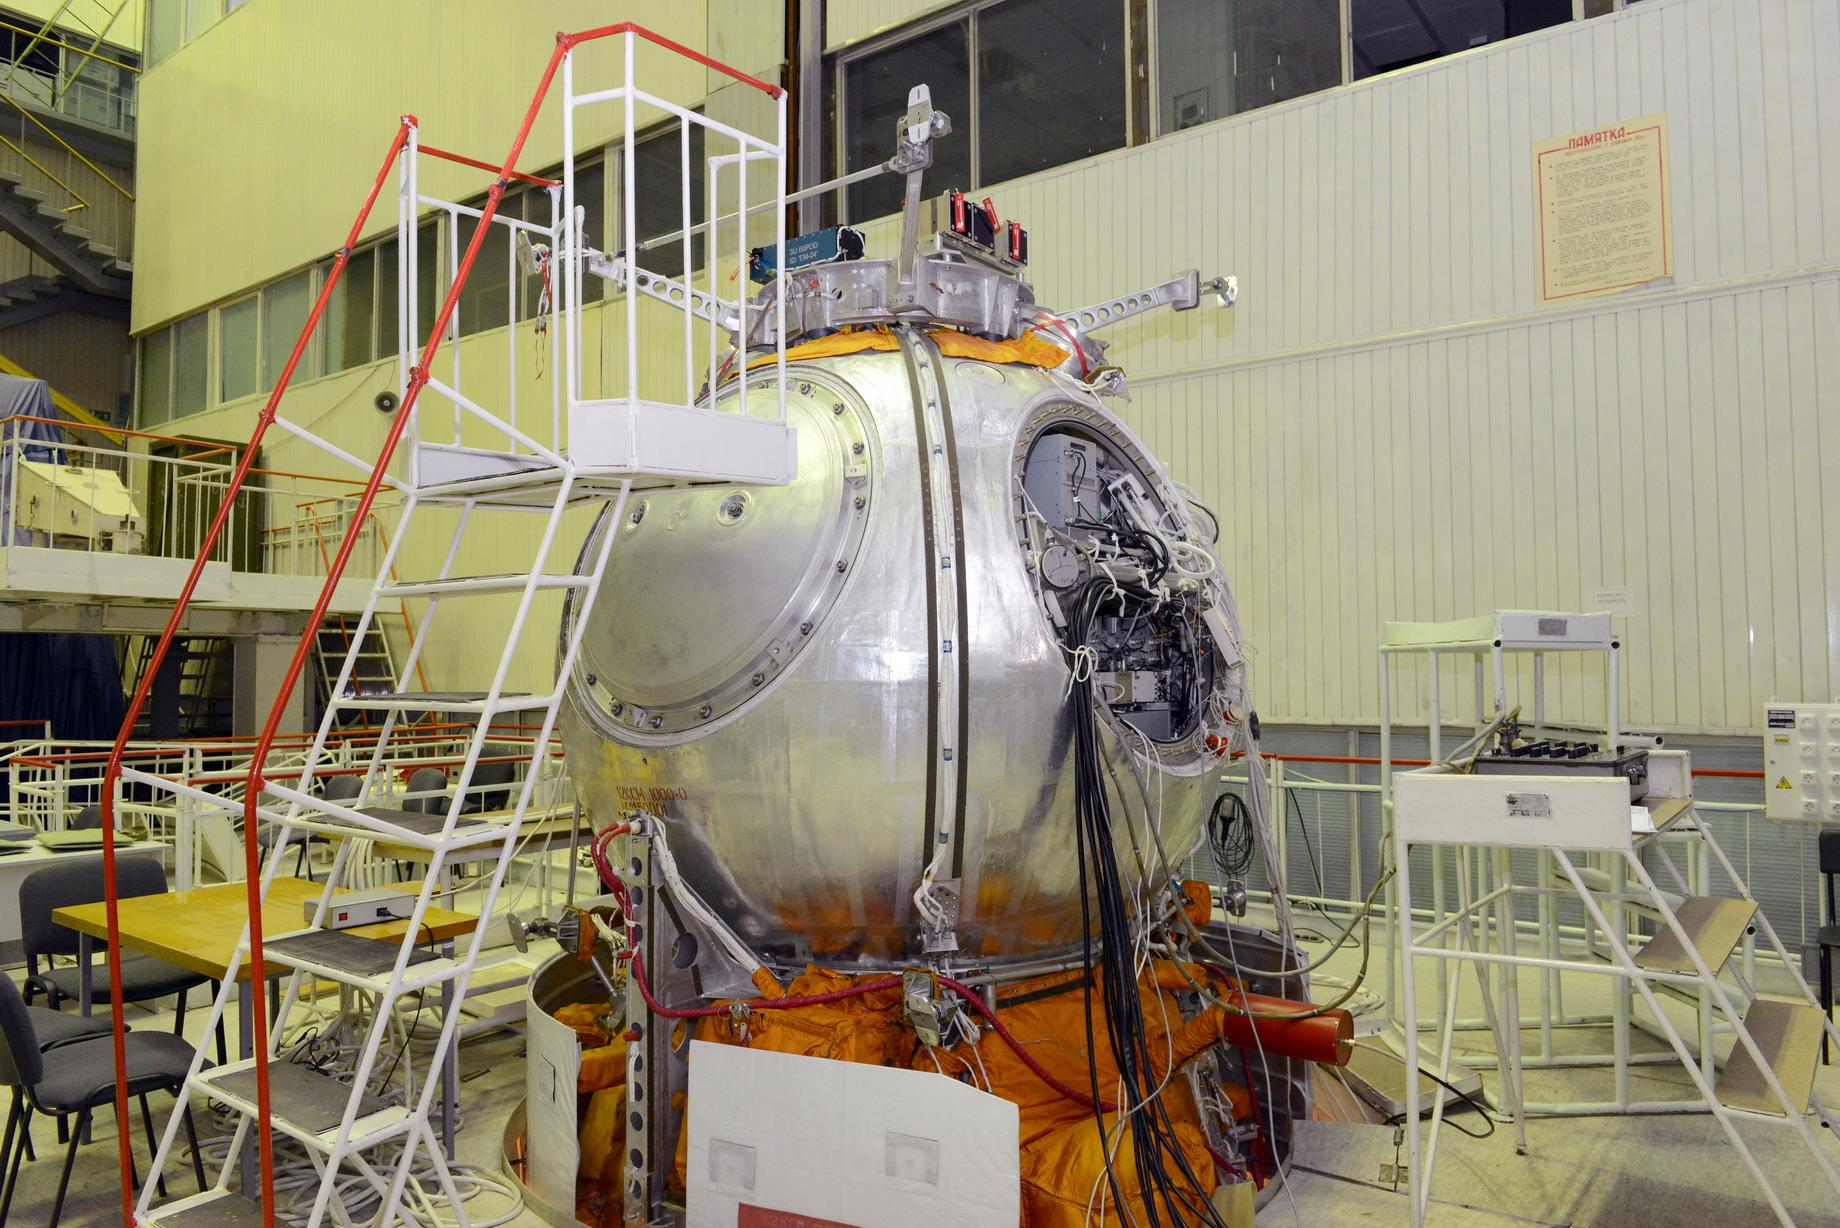 Bion-M1 Animal Space Capsule